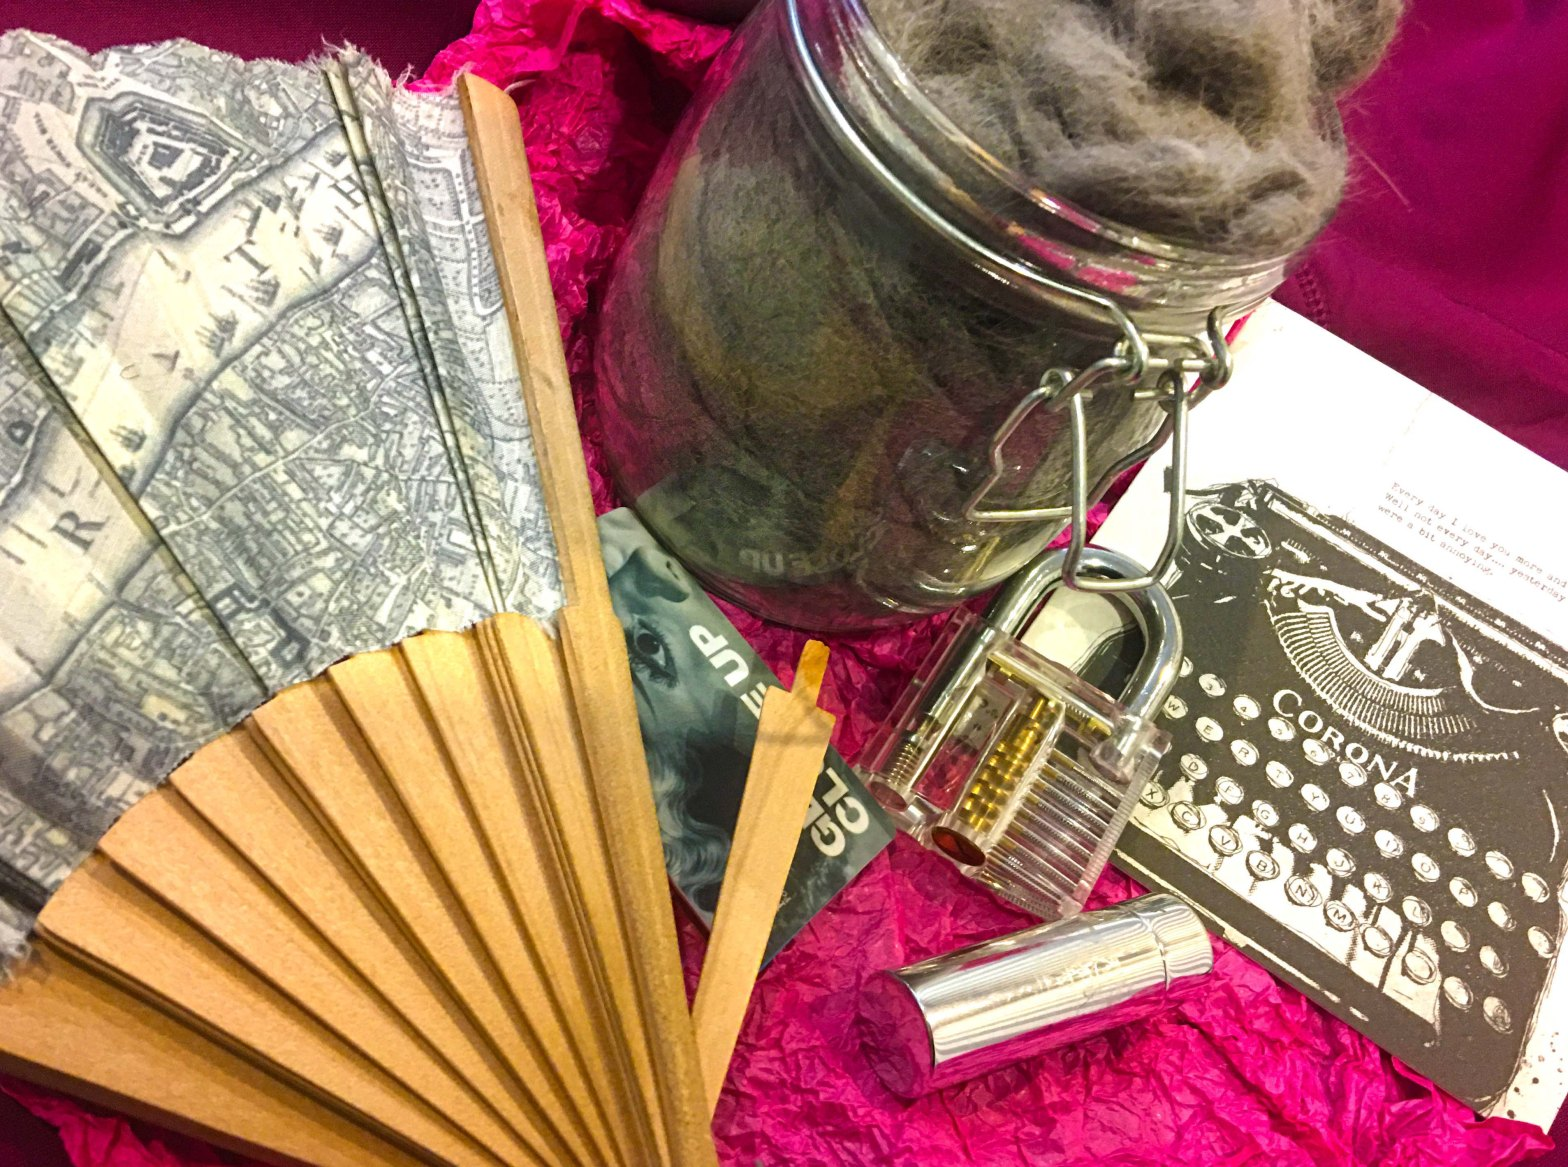 Photograph of various personal items: London map fan, lockpicking practice lock, lipstick, BFI membership card, card featuring Corona typewriter, and jar full of BlueBlue's cat fur.